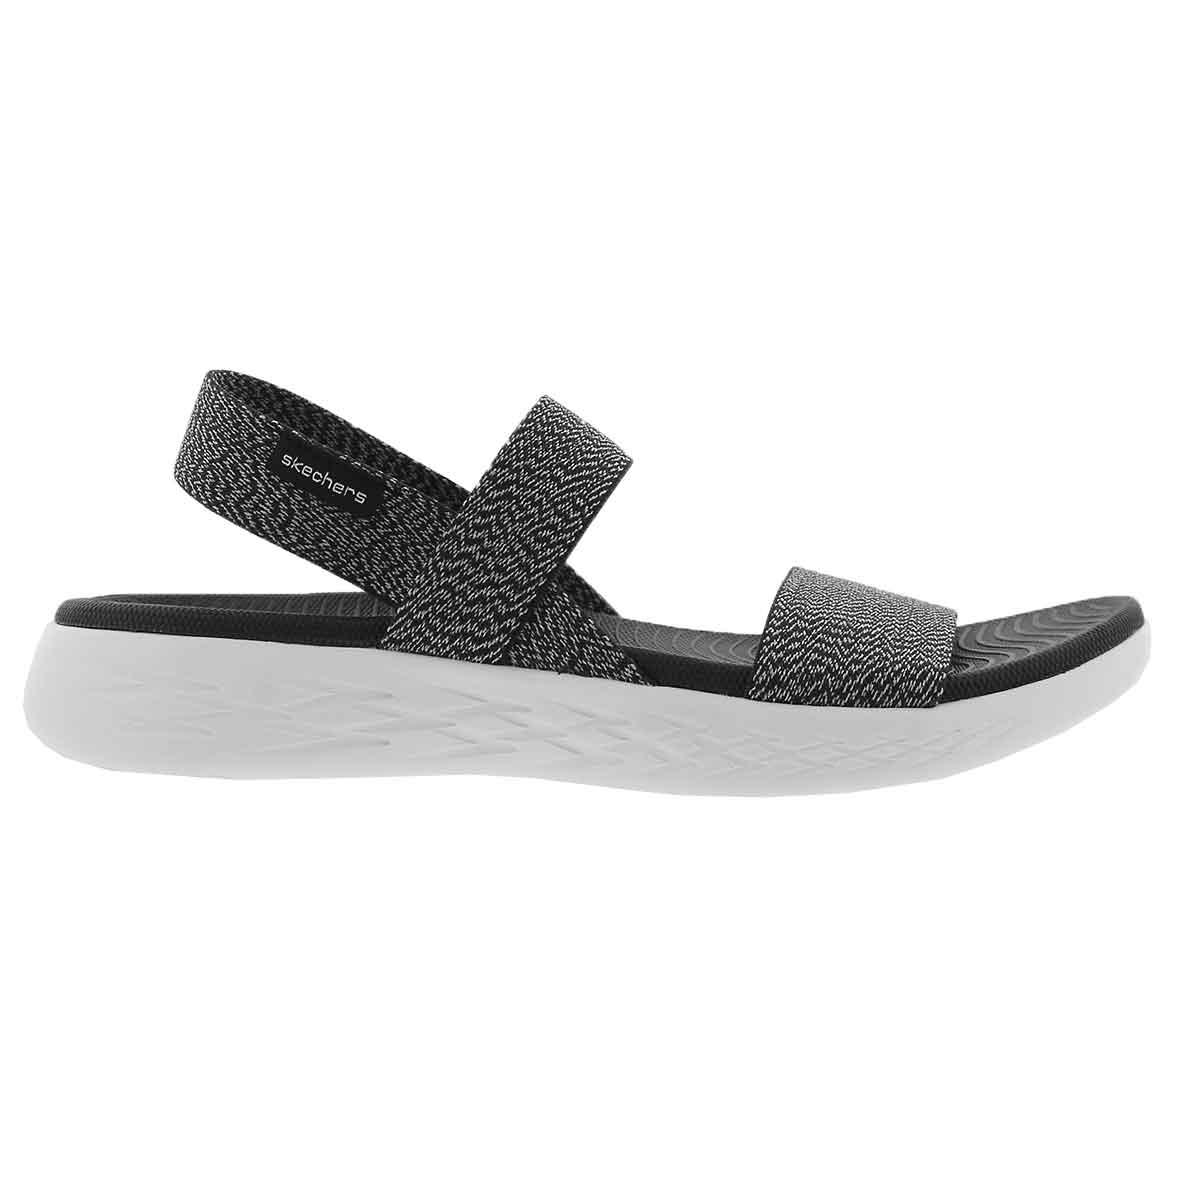 Lds OnTheGo 600 Ideal bk/wt sport sandal